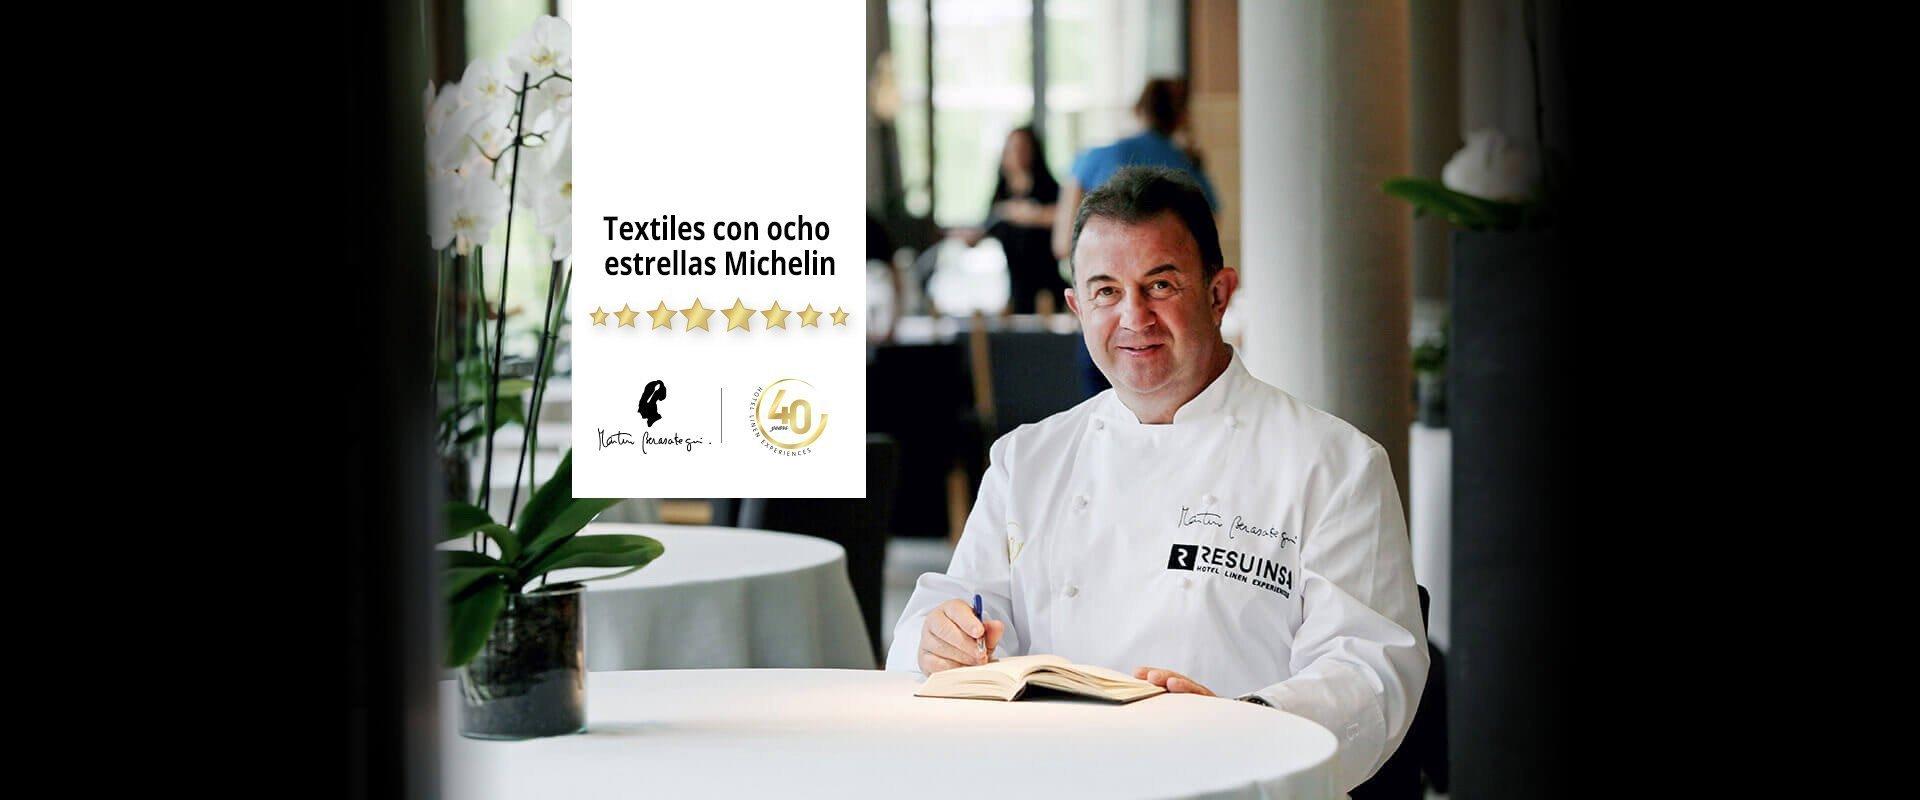 textiles-con-ocho-estrellas-michelin